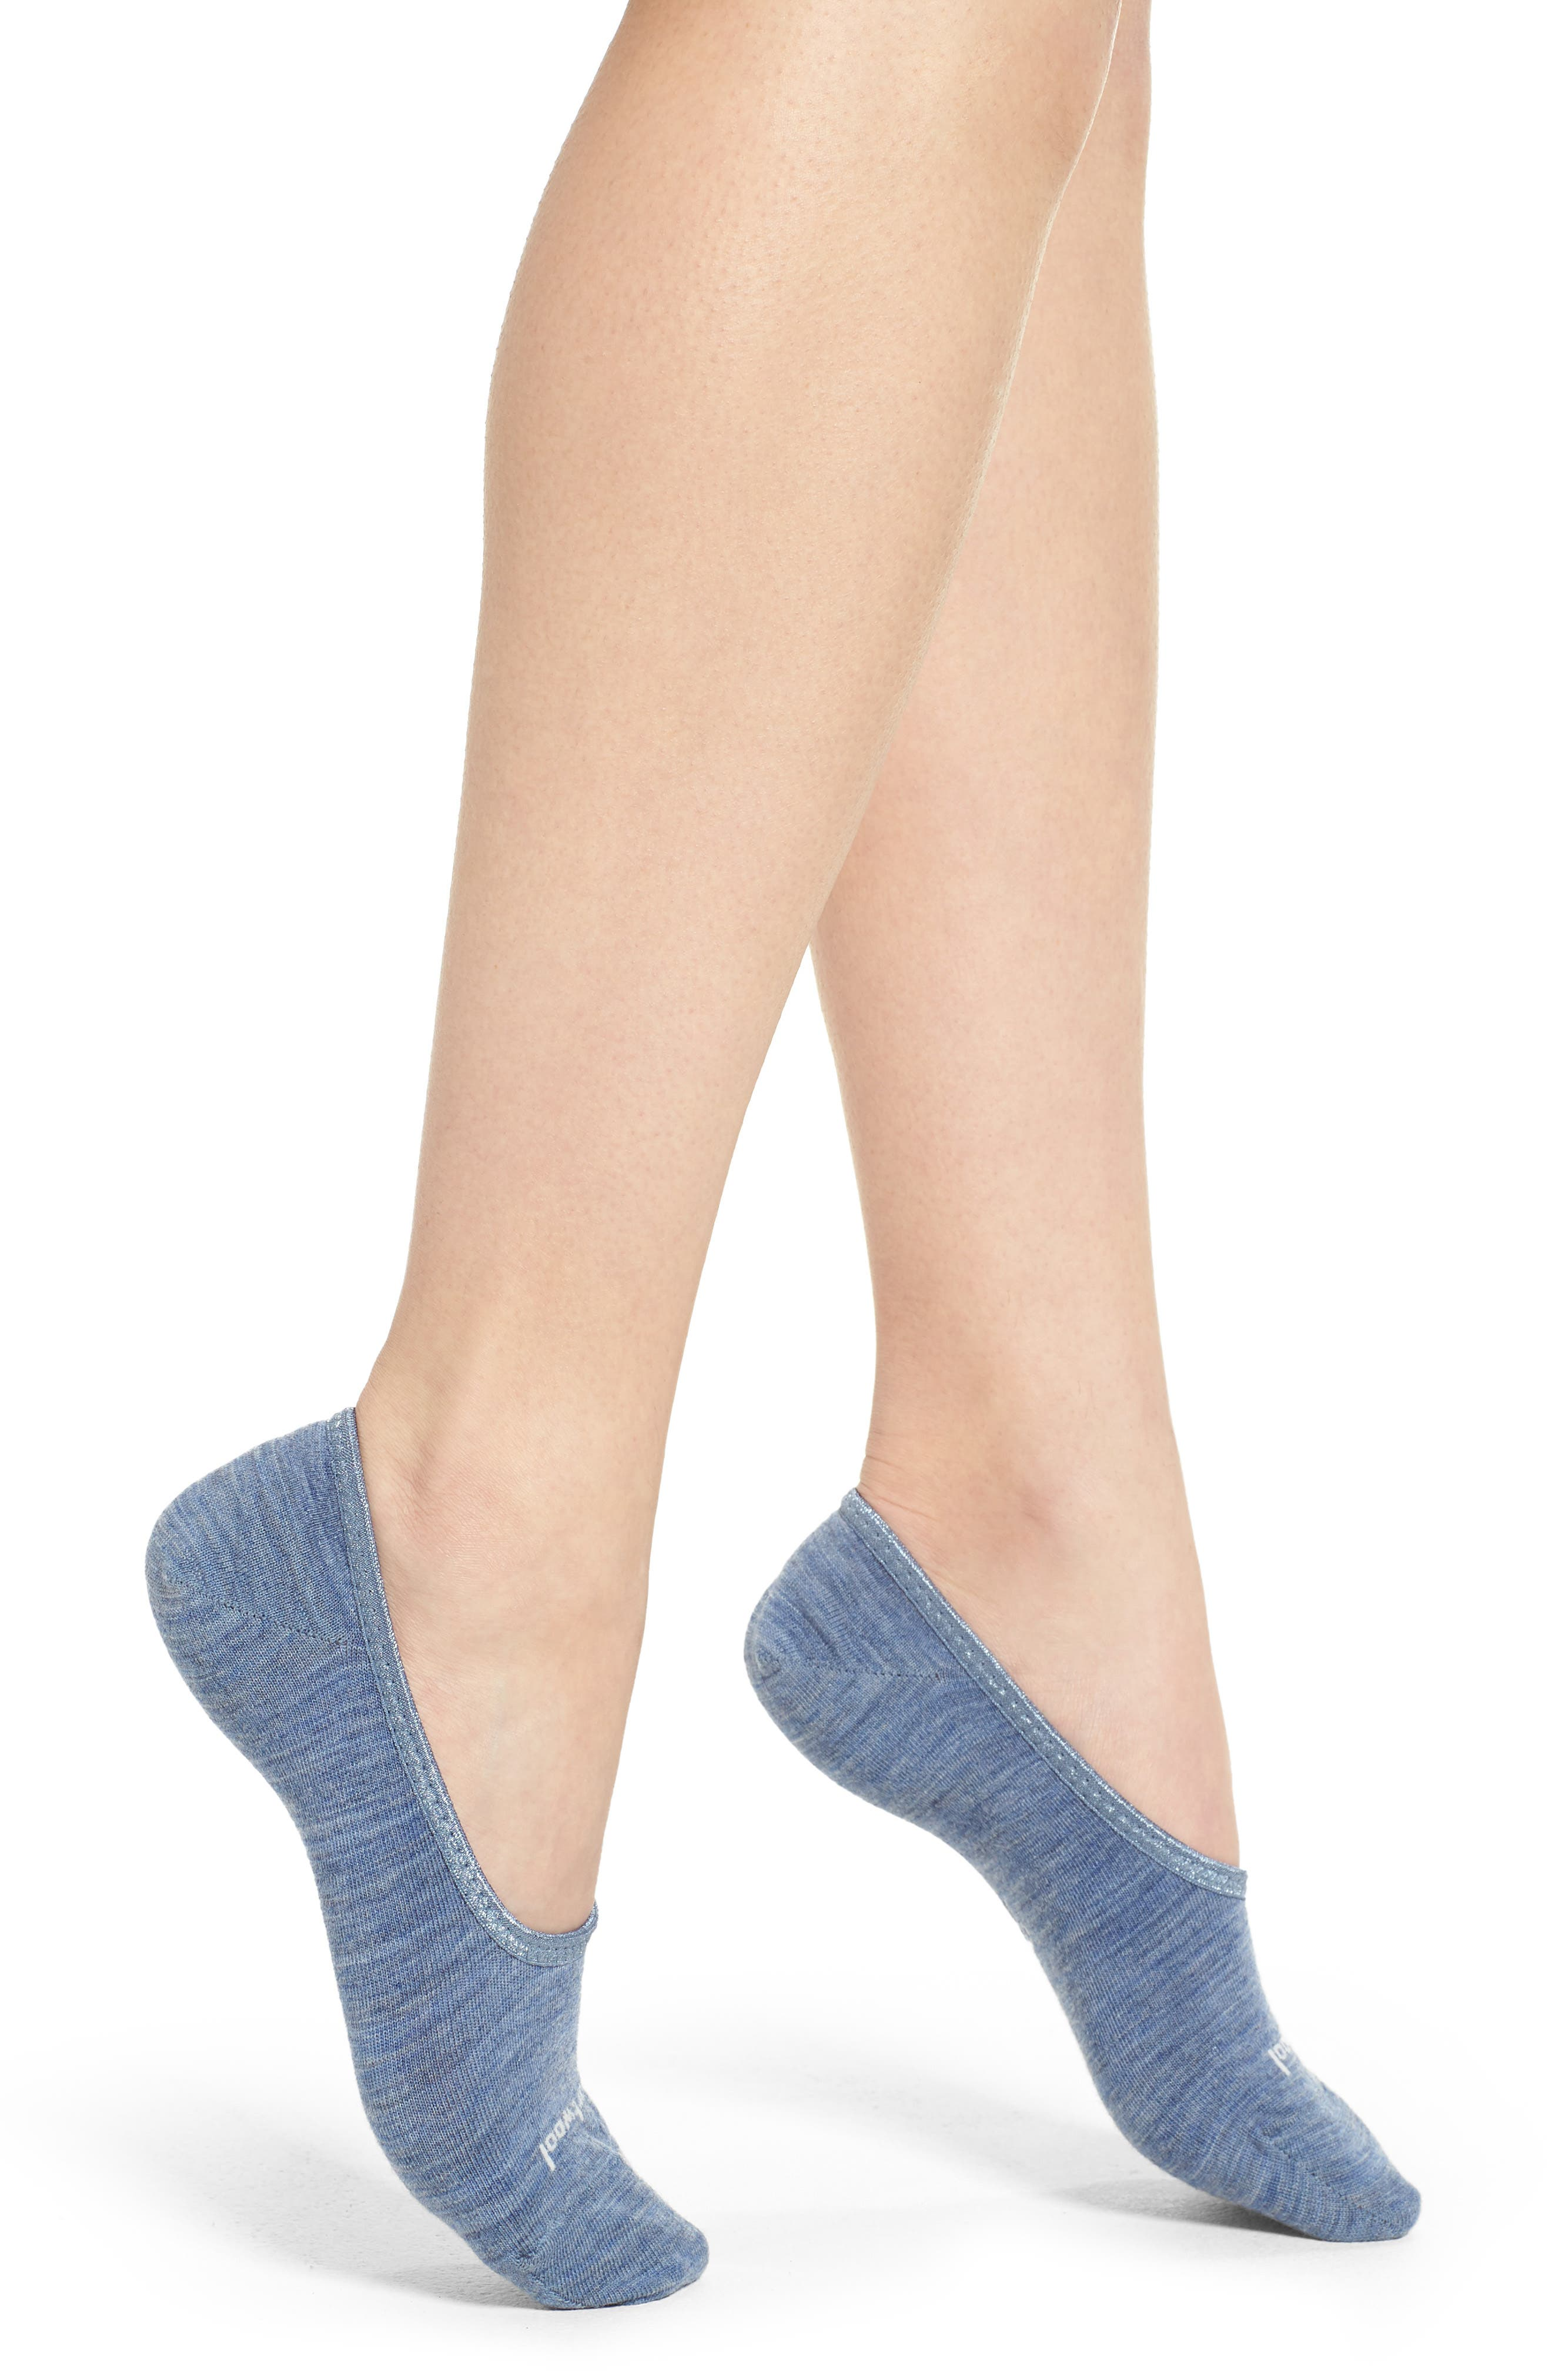 'Hide and Seek' No-Show Socks,                         Main,                         color, Blue Steel